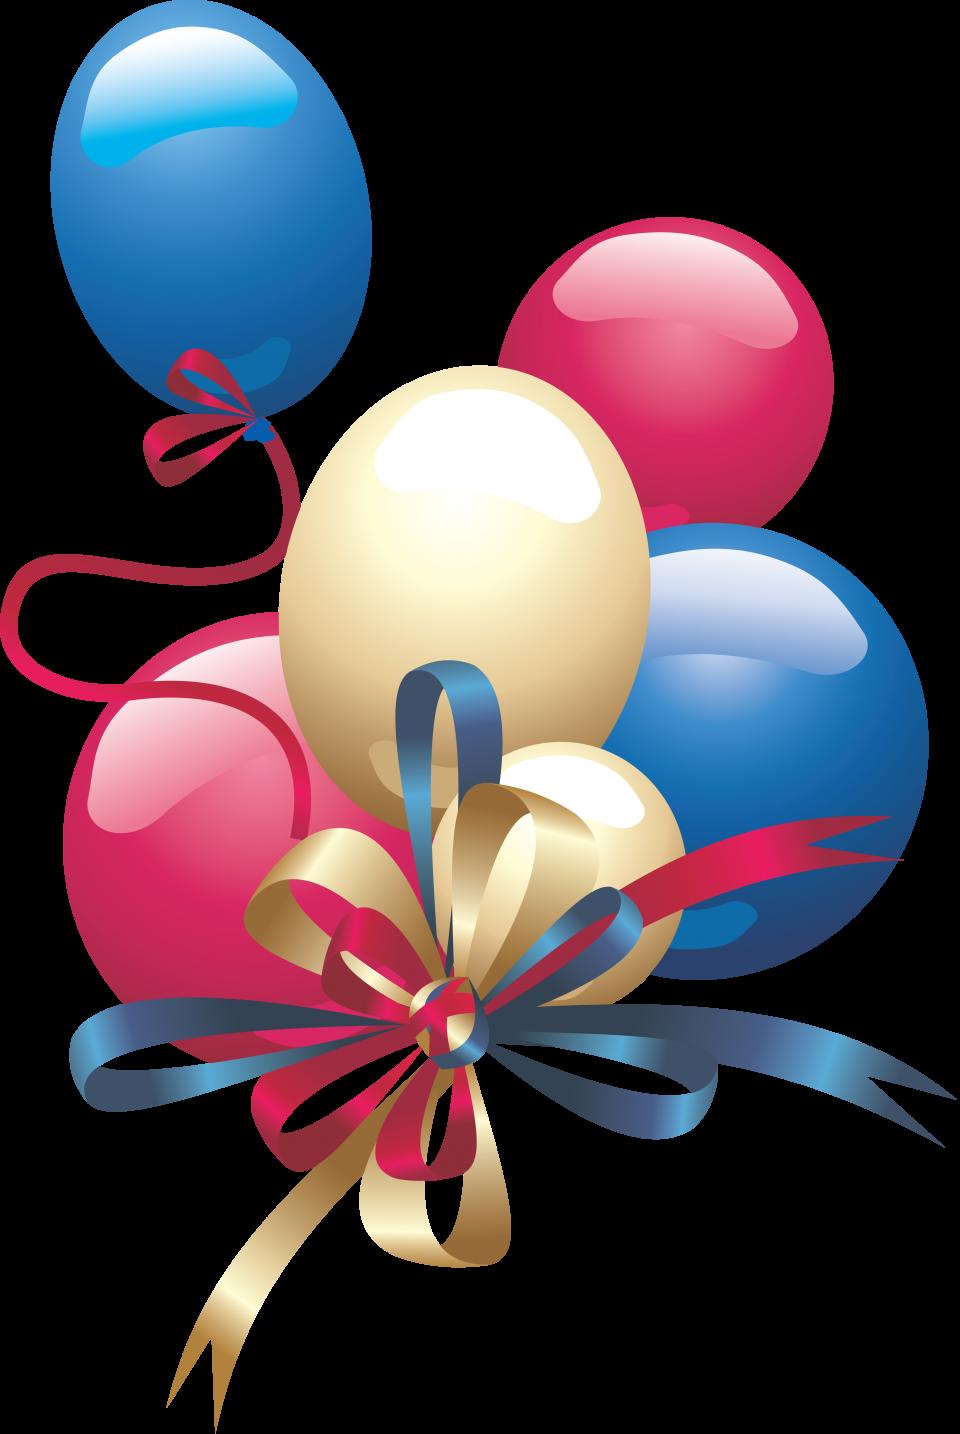 Festive Birthday Balloons PNG Image